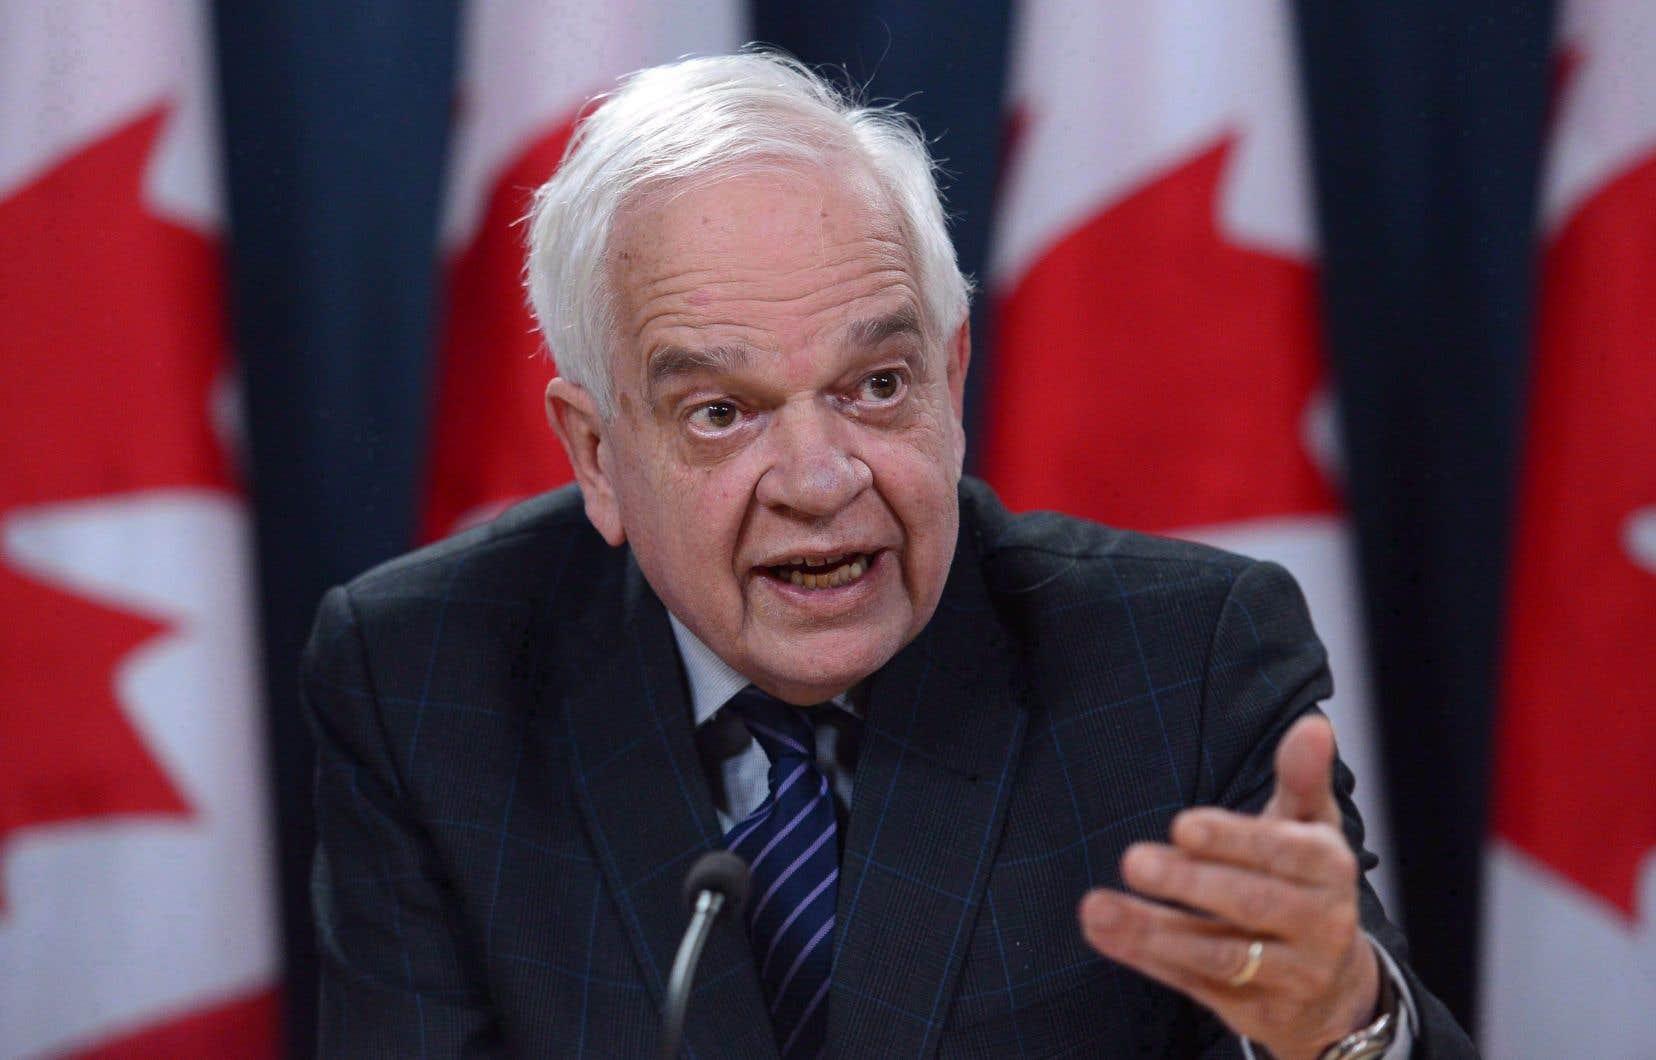 L'ambassadeur canadien à Pékin, John McCallum